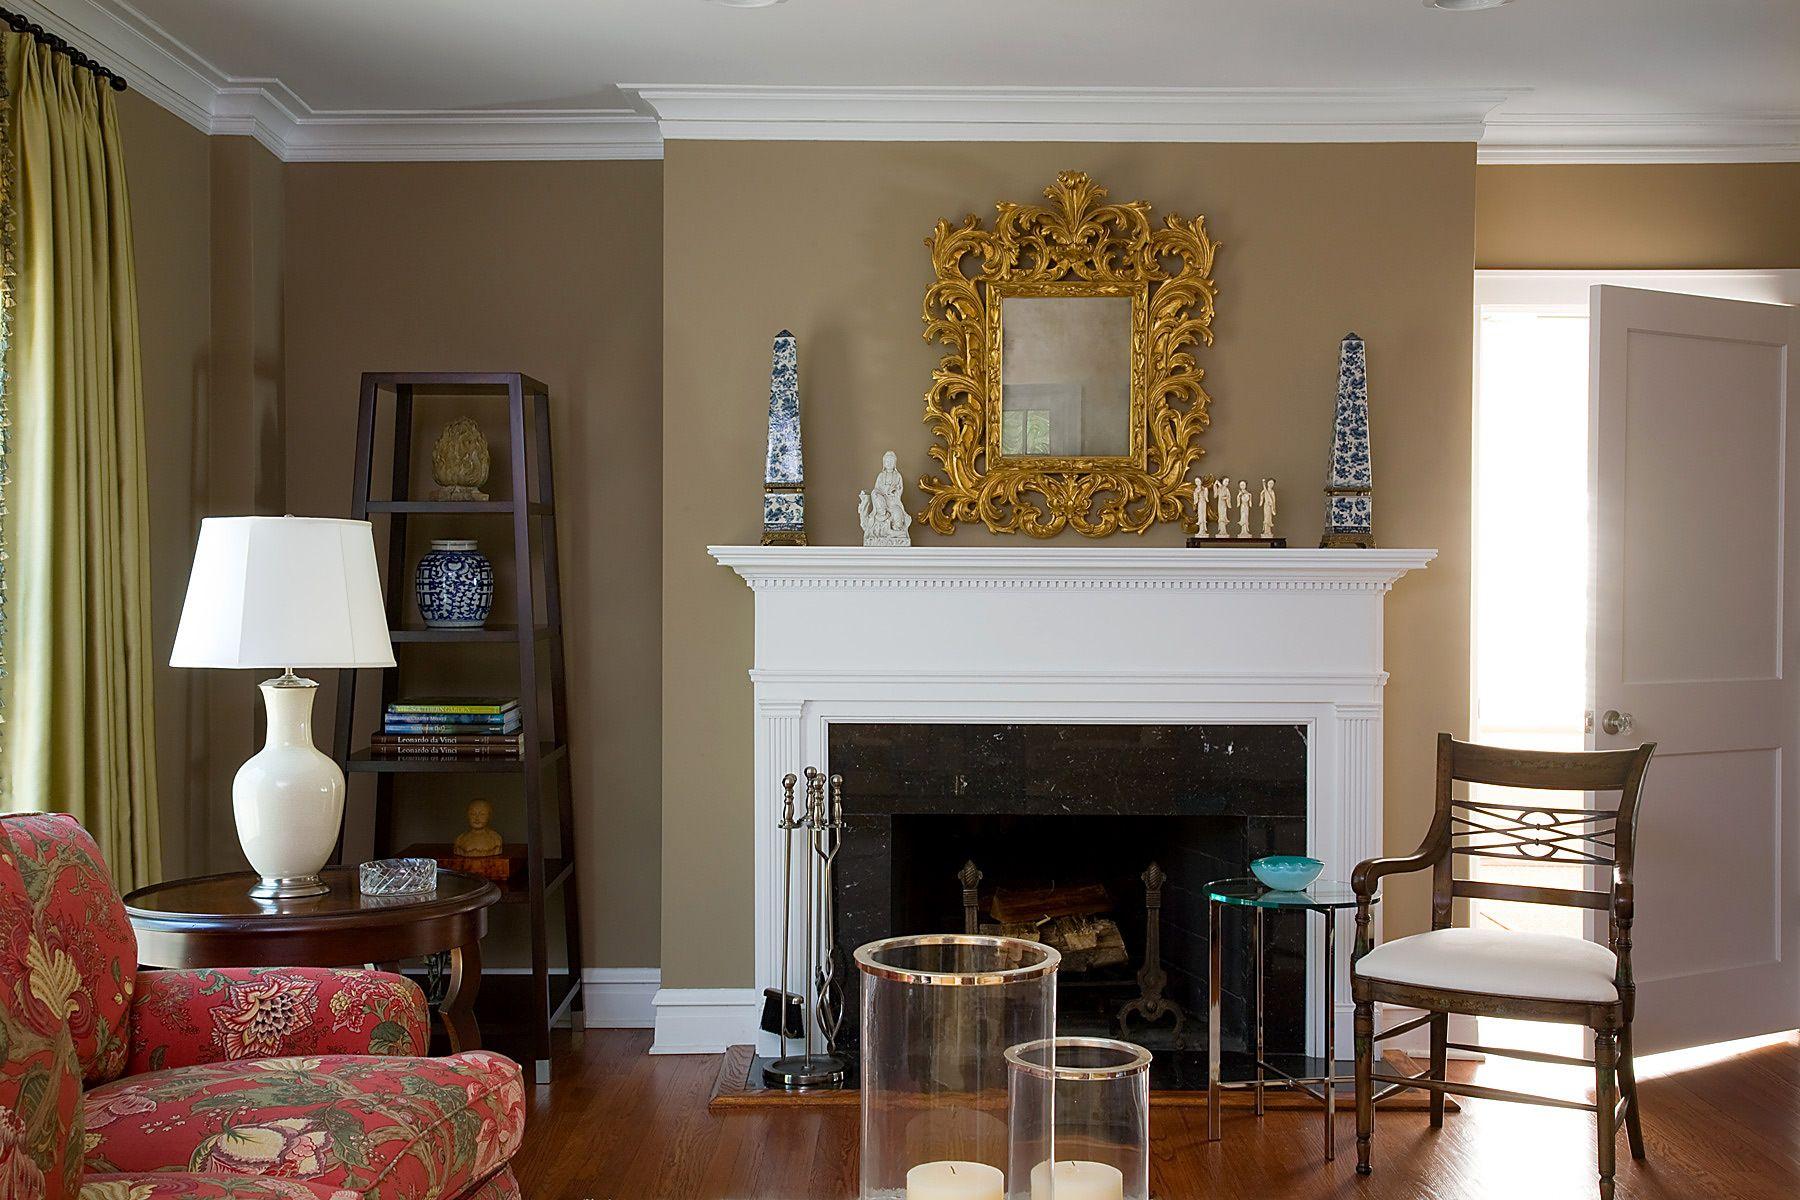 1living_room_fireplaceresharpen